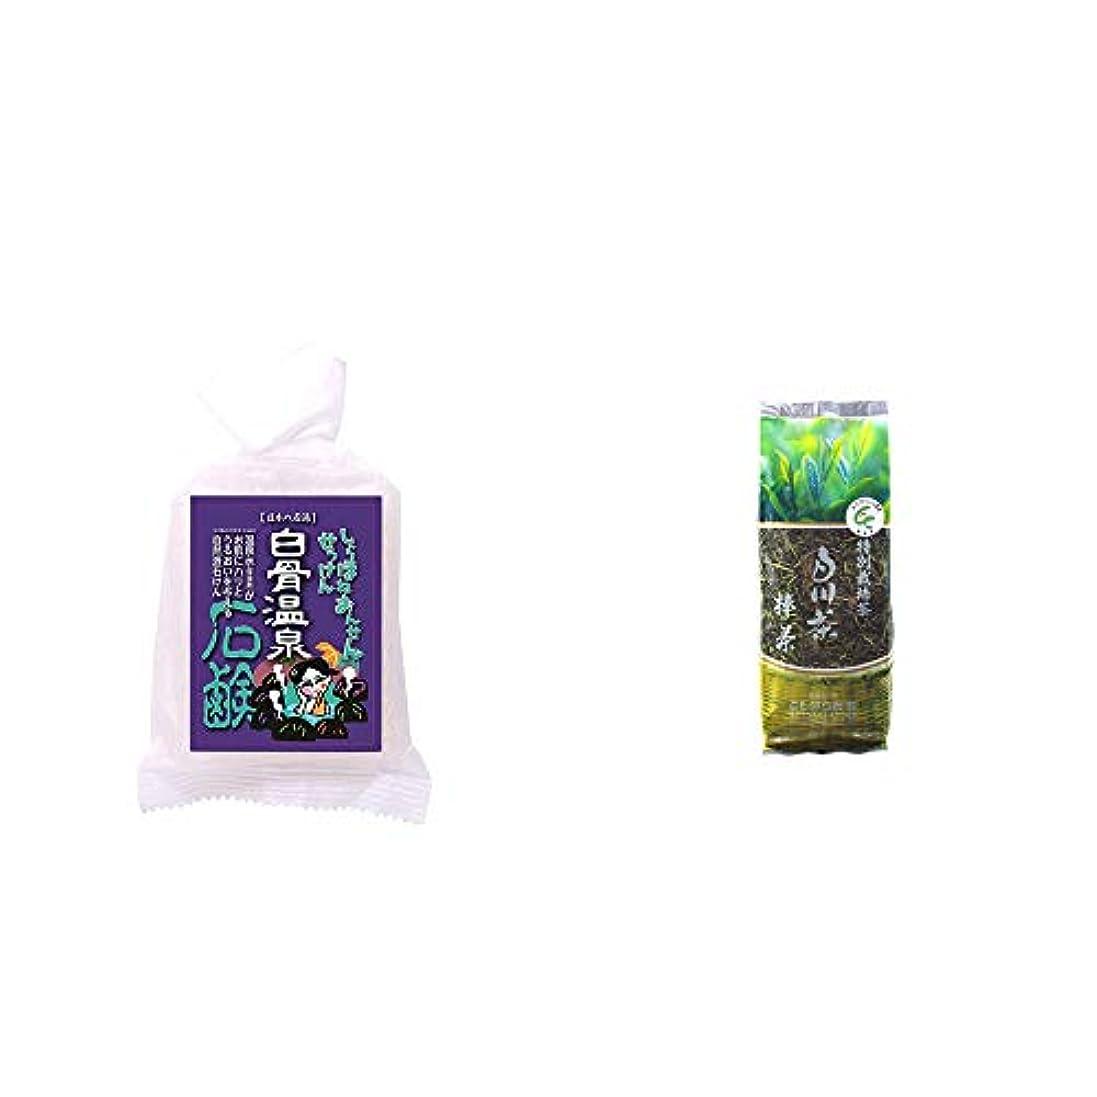 計算ラフ睡眠私達[2点セット] 信州 白骨温泉石鹸(80g)?白川茶 特別栽培茶【棒茶】(150g)